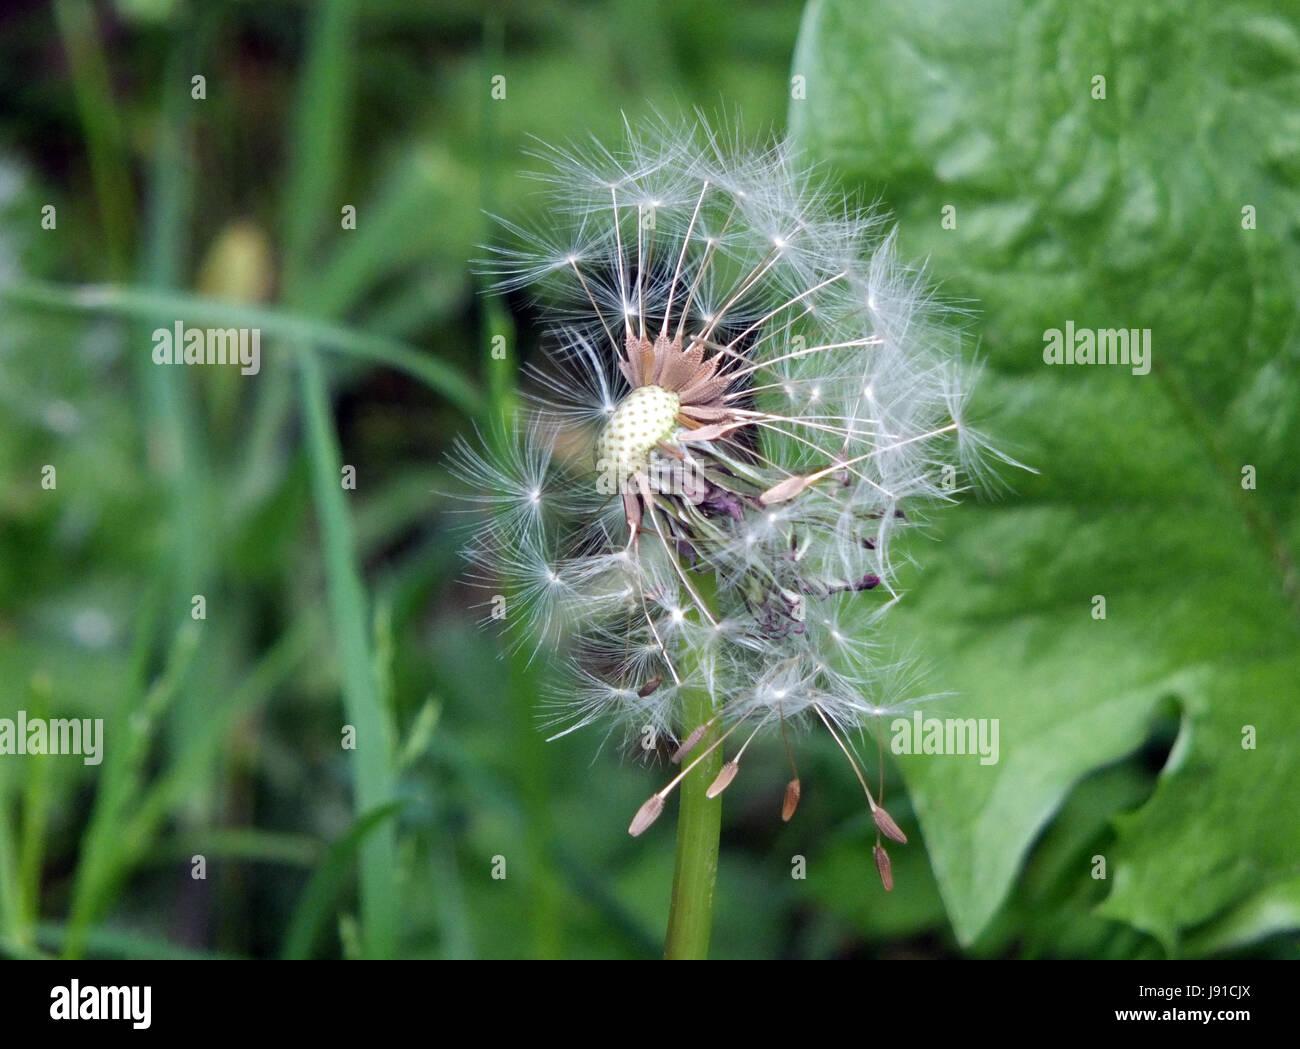 dandelion clock with seeds flying away - Stock Image